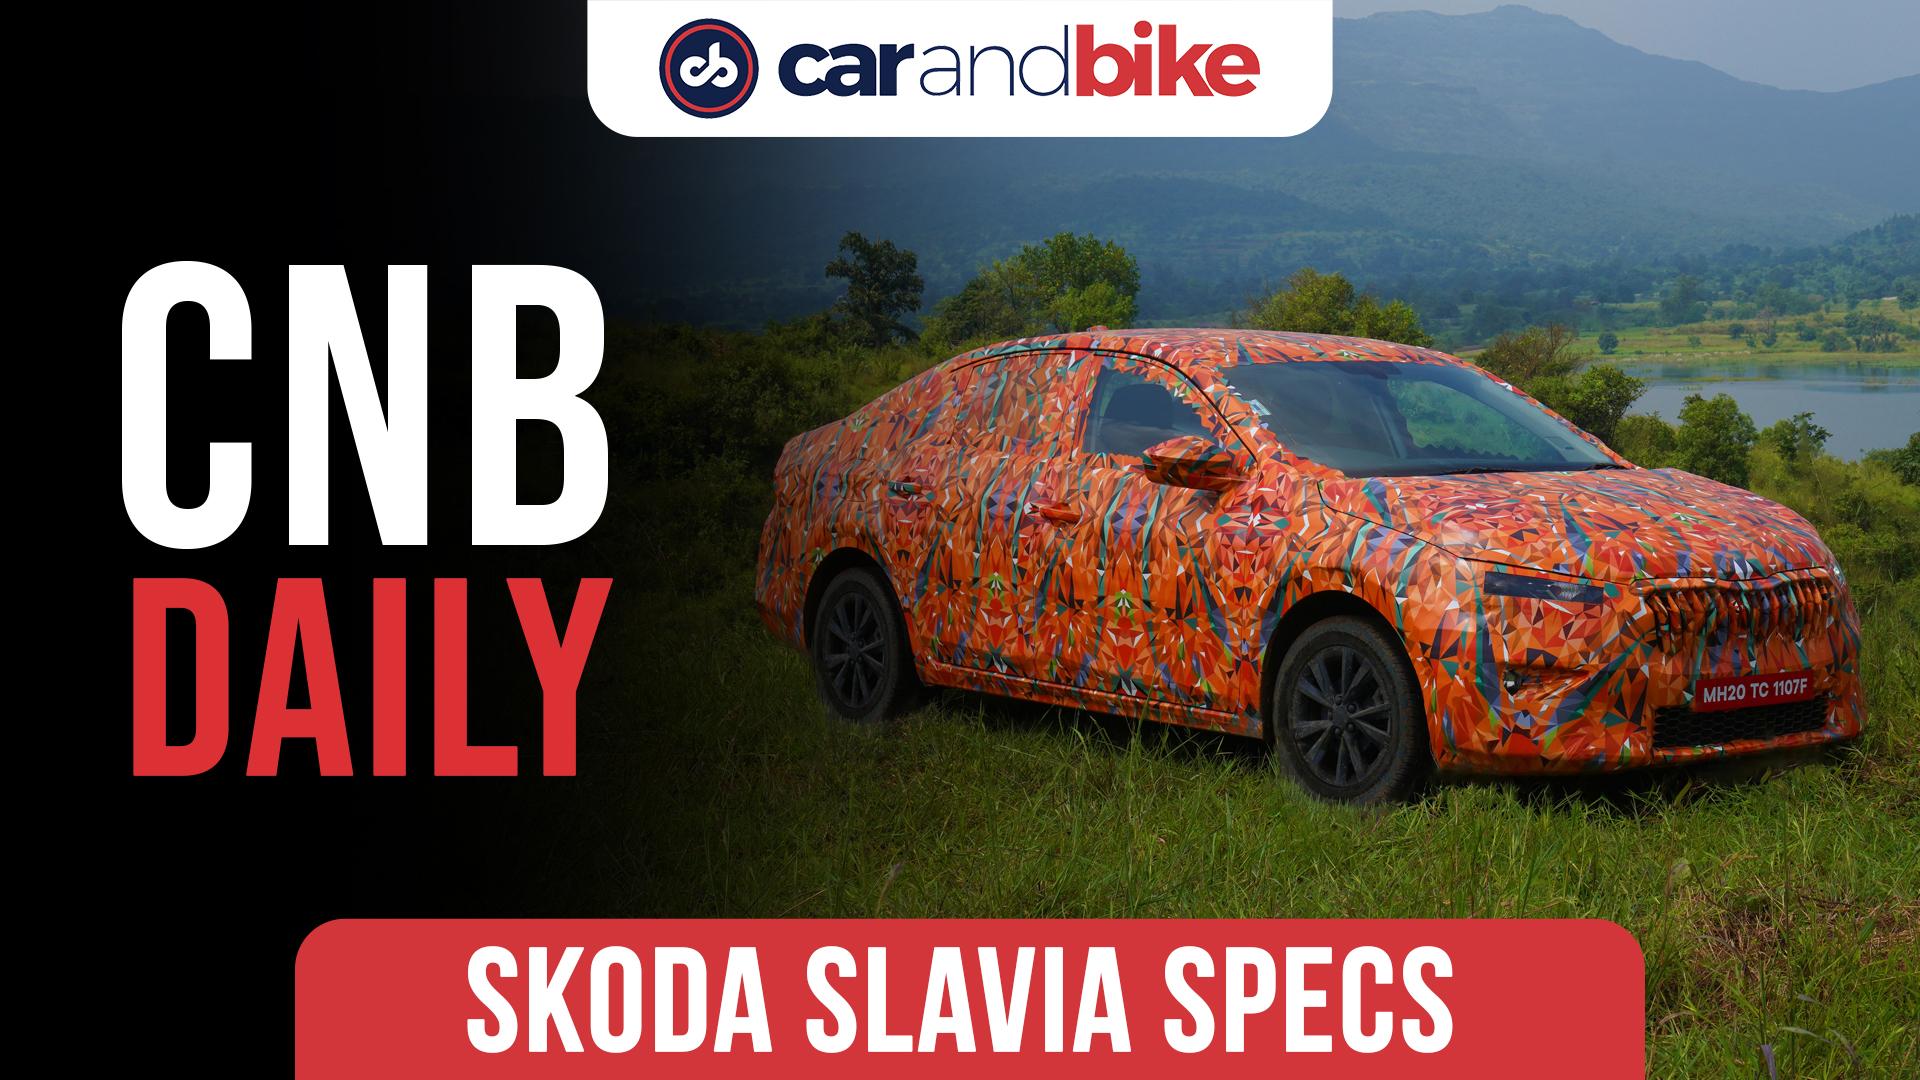 Skoda Slavia Compact Sedan specifications revealed